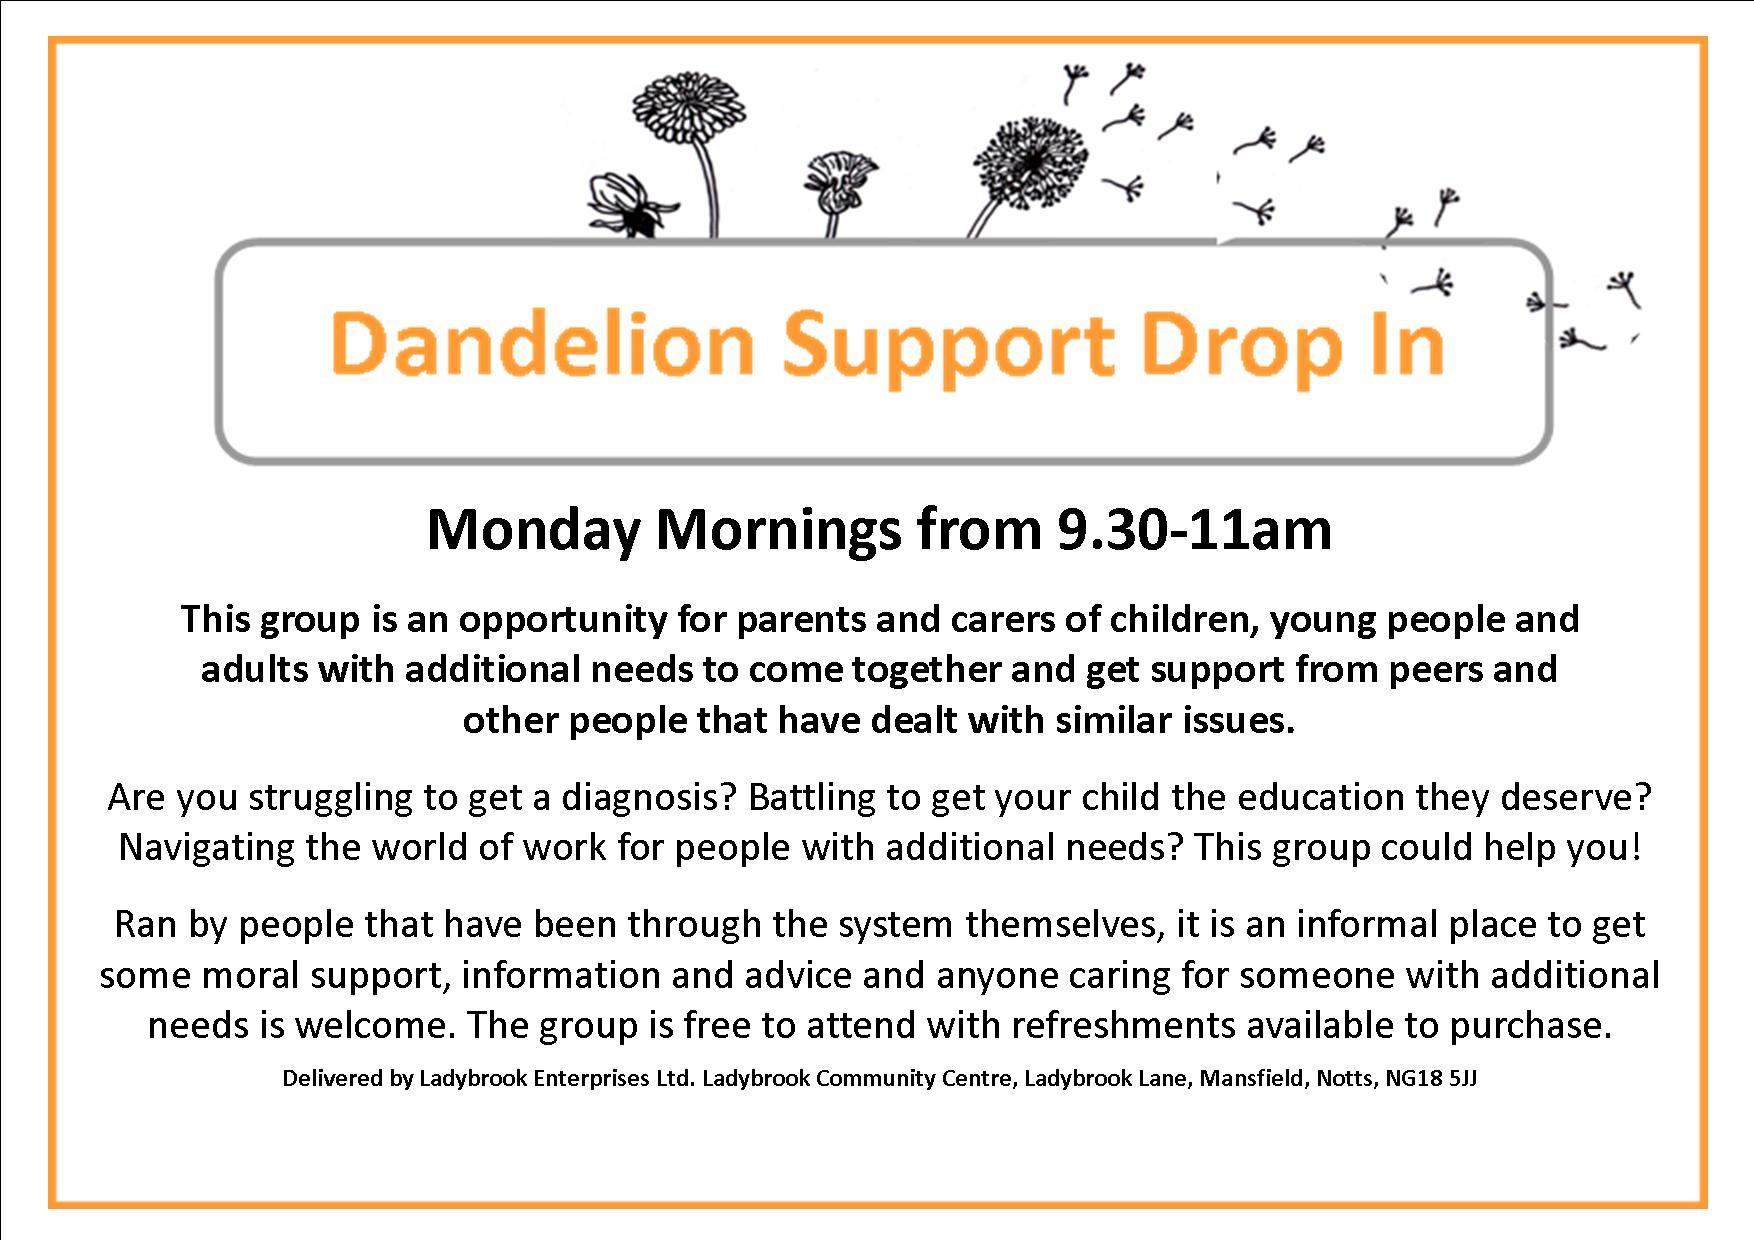 dandelion support